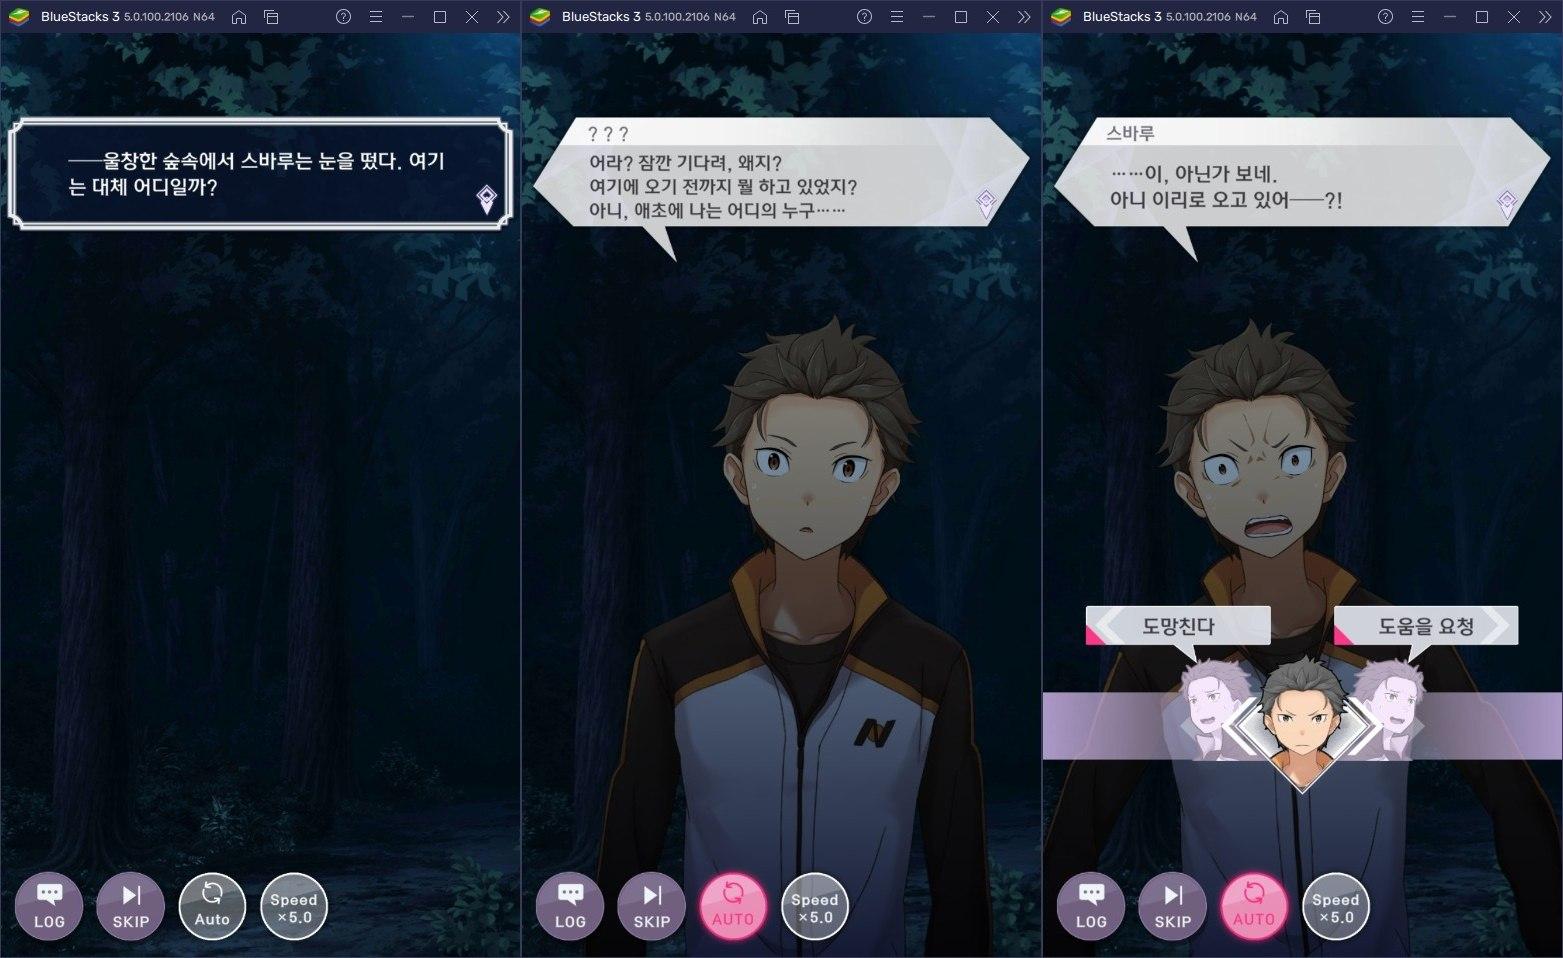 Re : 제로부터 시작하는 이세계 생활 Lost in Memories, 리제로 LIM을 지금 바로 블루스택에서 만나봐요!